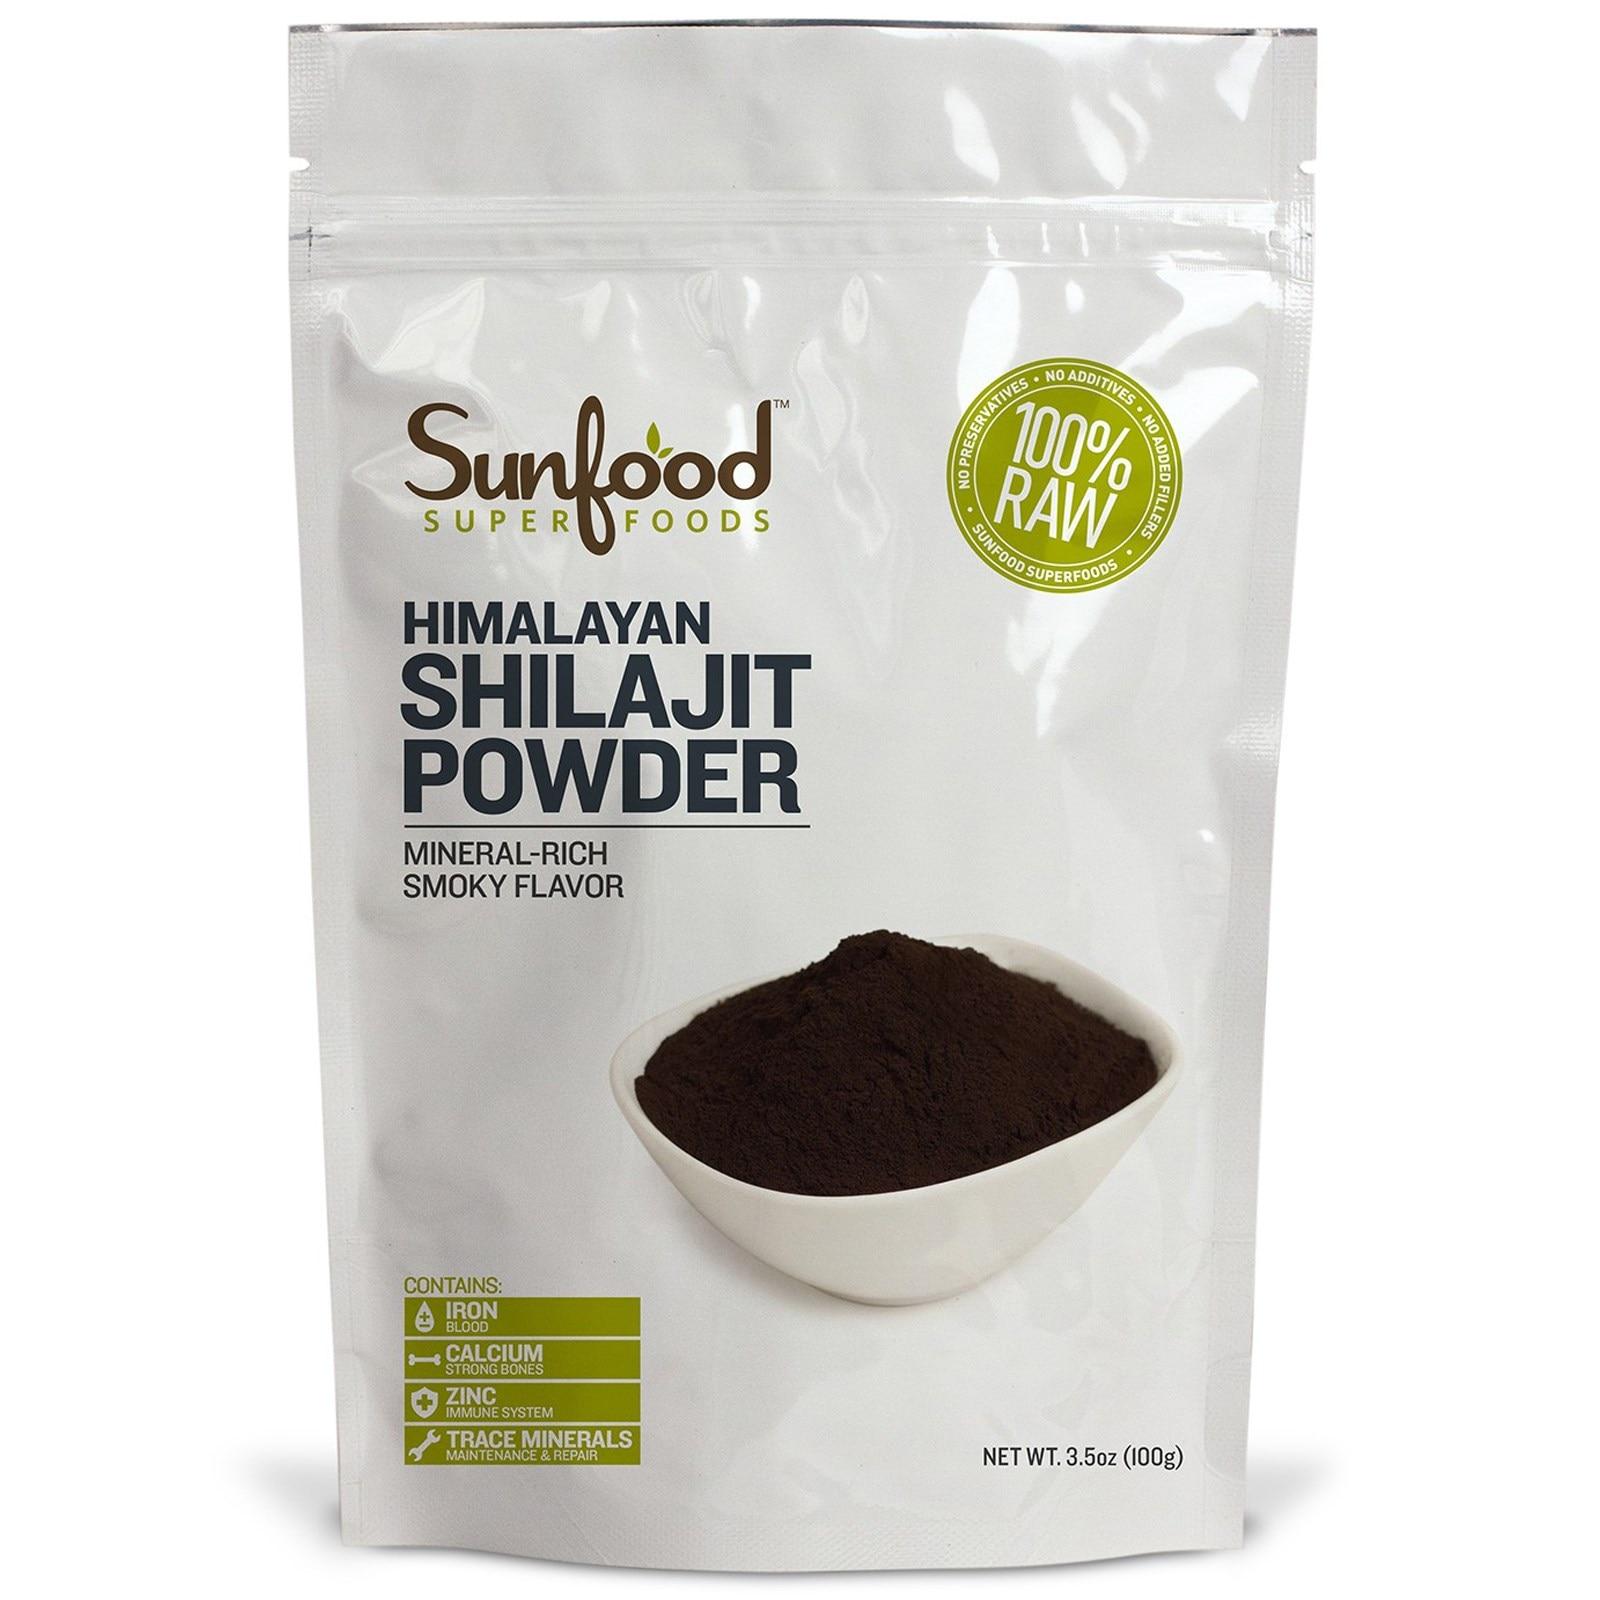 Sunfood shilajit powder Himalayan Xilaizhi powder Original unprocessed Vegetarian Relief Anxiety and Stress,Prolong Life